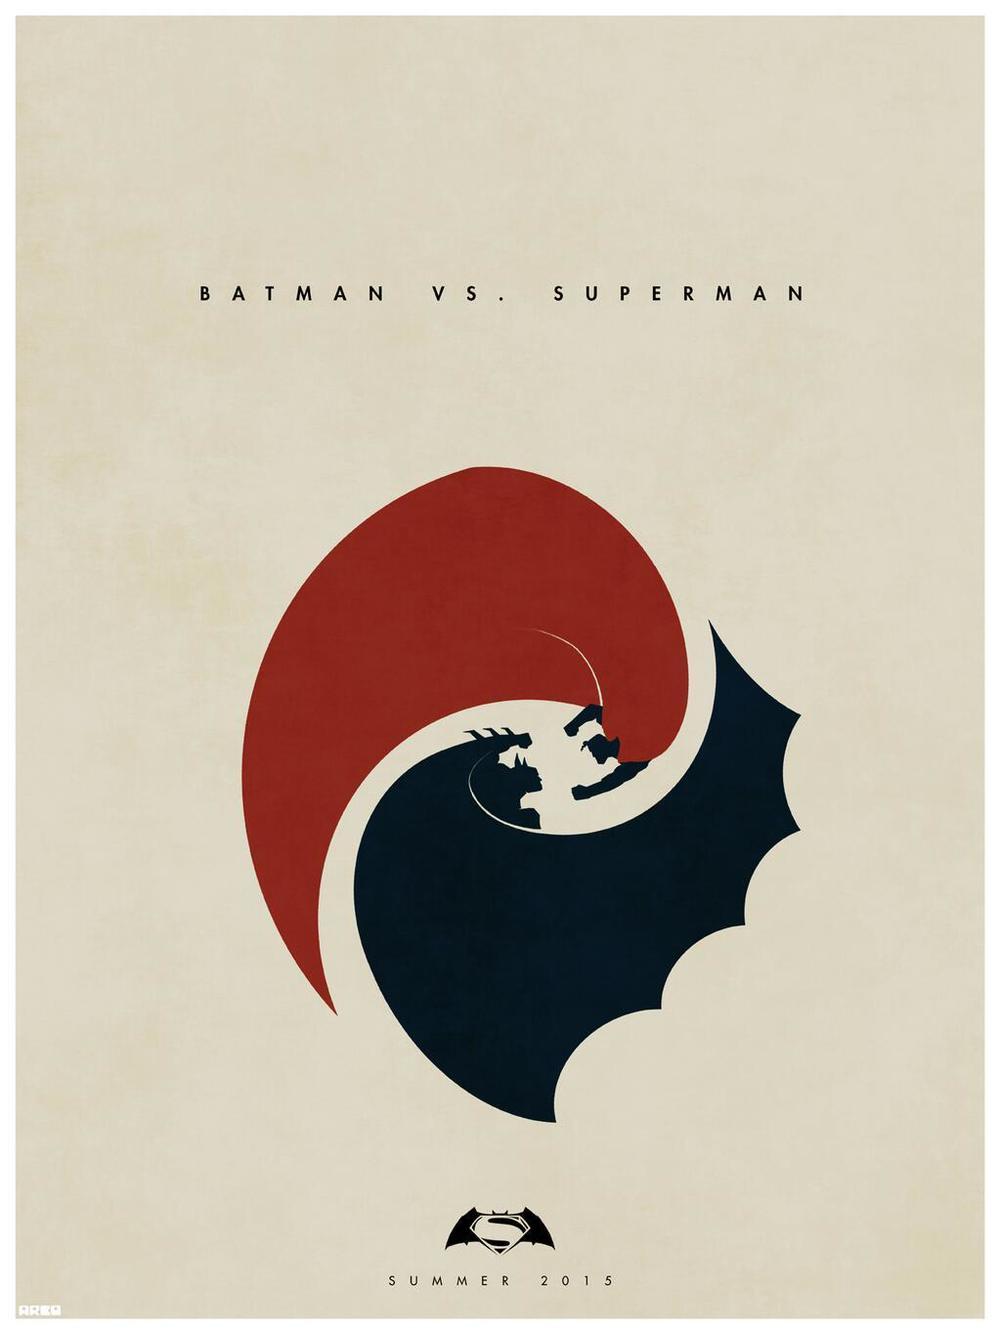 BATMAN VS. SUPERMAN Yin and Yang Fan-Made Poster Art ...